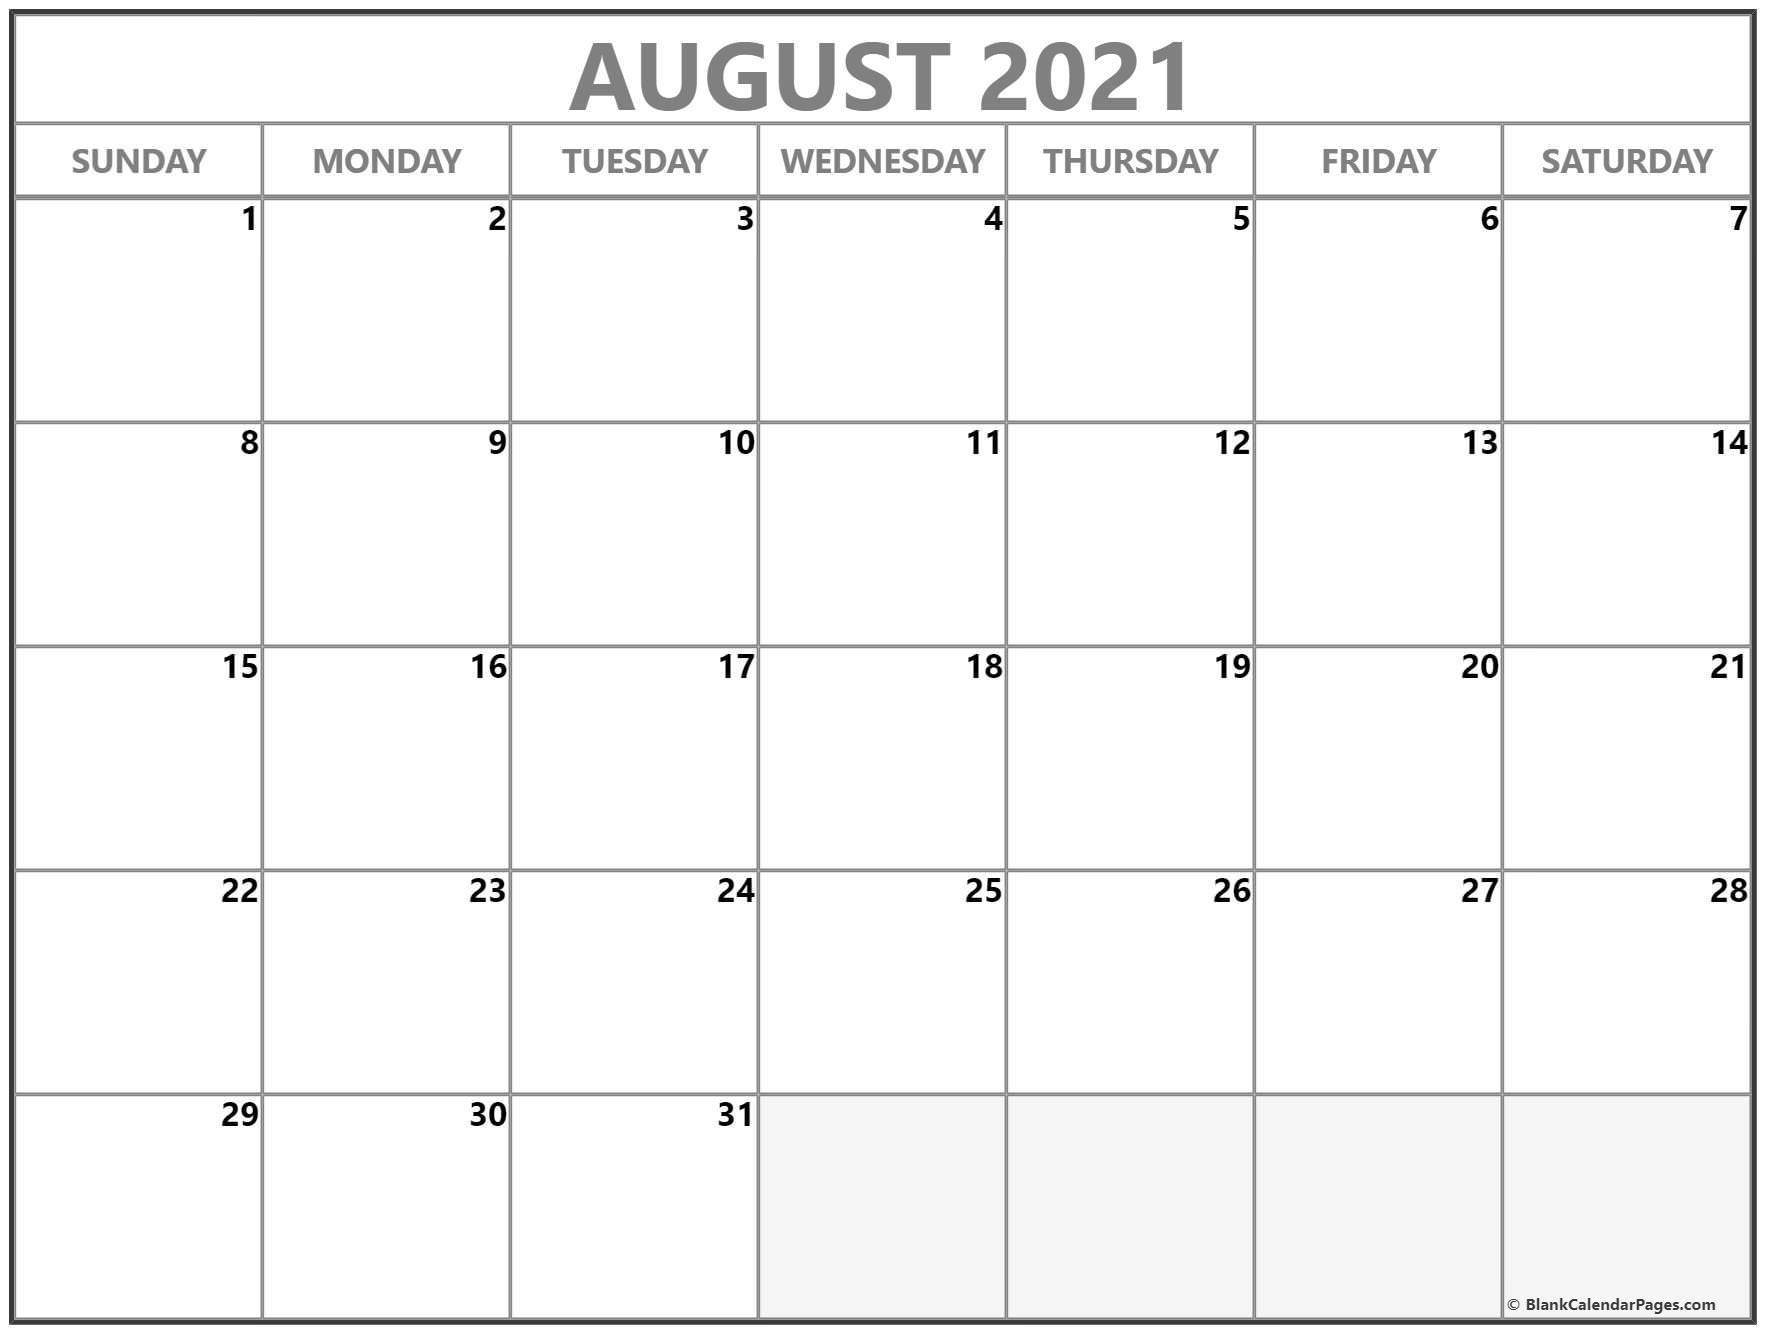 Take Leo August 2021 Calender